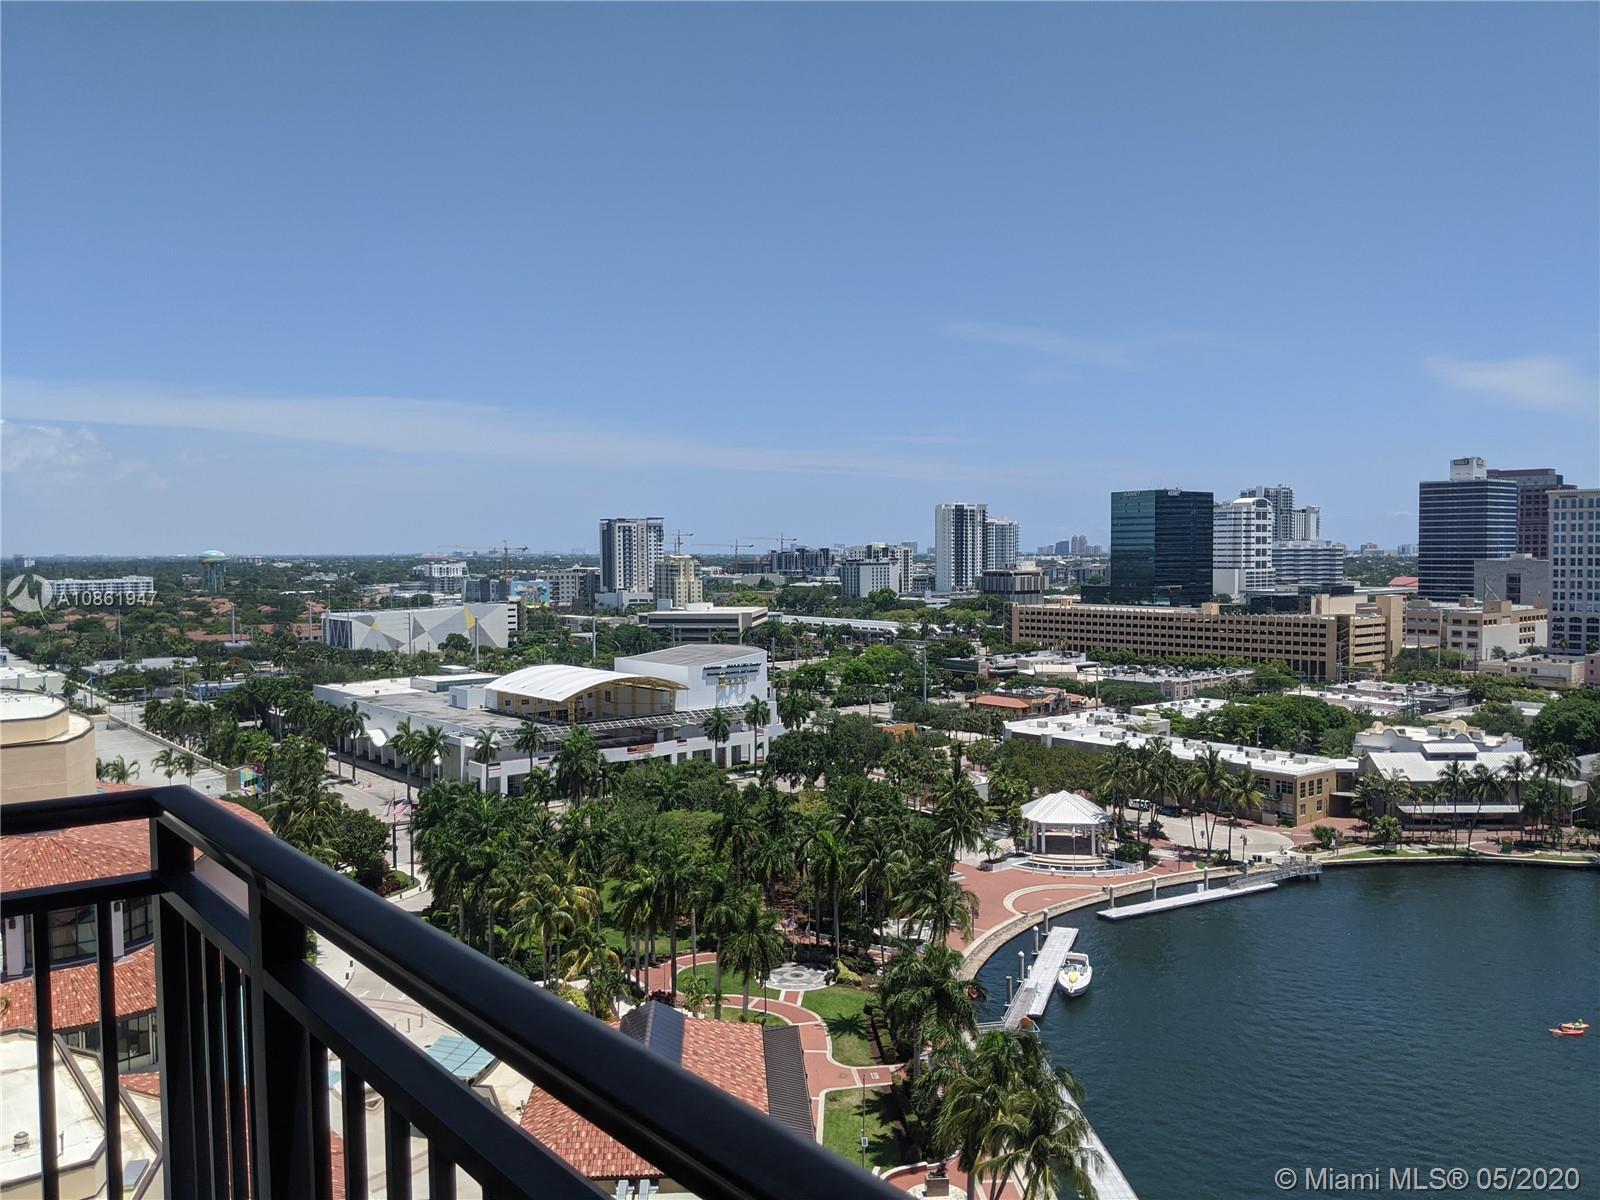 Symphony #1618N - 610 W Las Olas Blvd #1618N, Fort Lauderdale, FL 33312